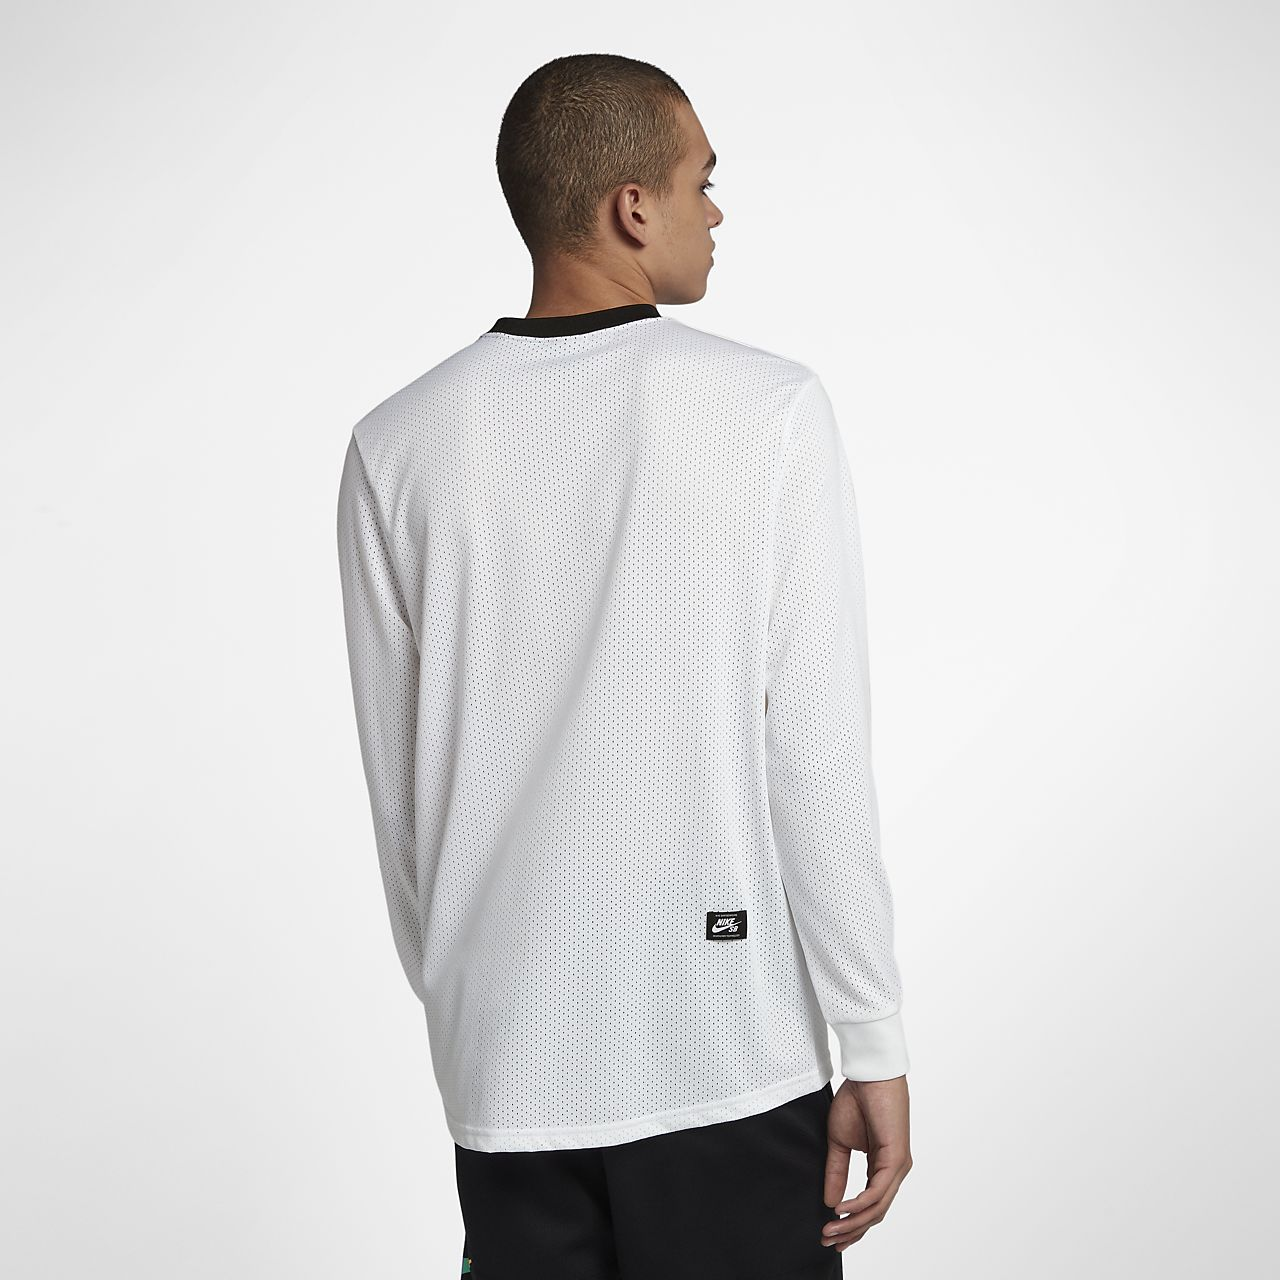 buy popular d83e5 bc6c4 ... Nike SB Dri-FIT Men s Long-Sleeve Top